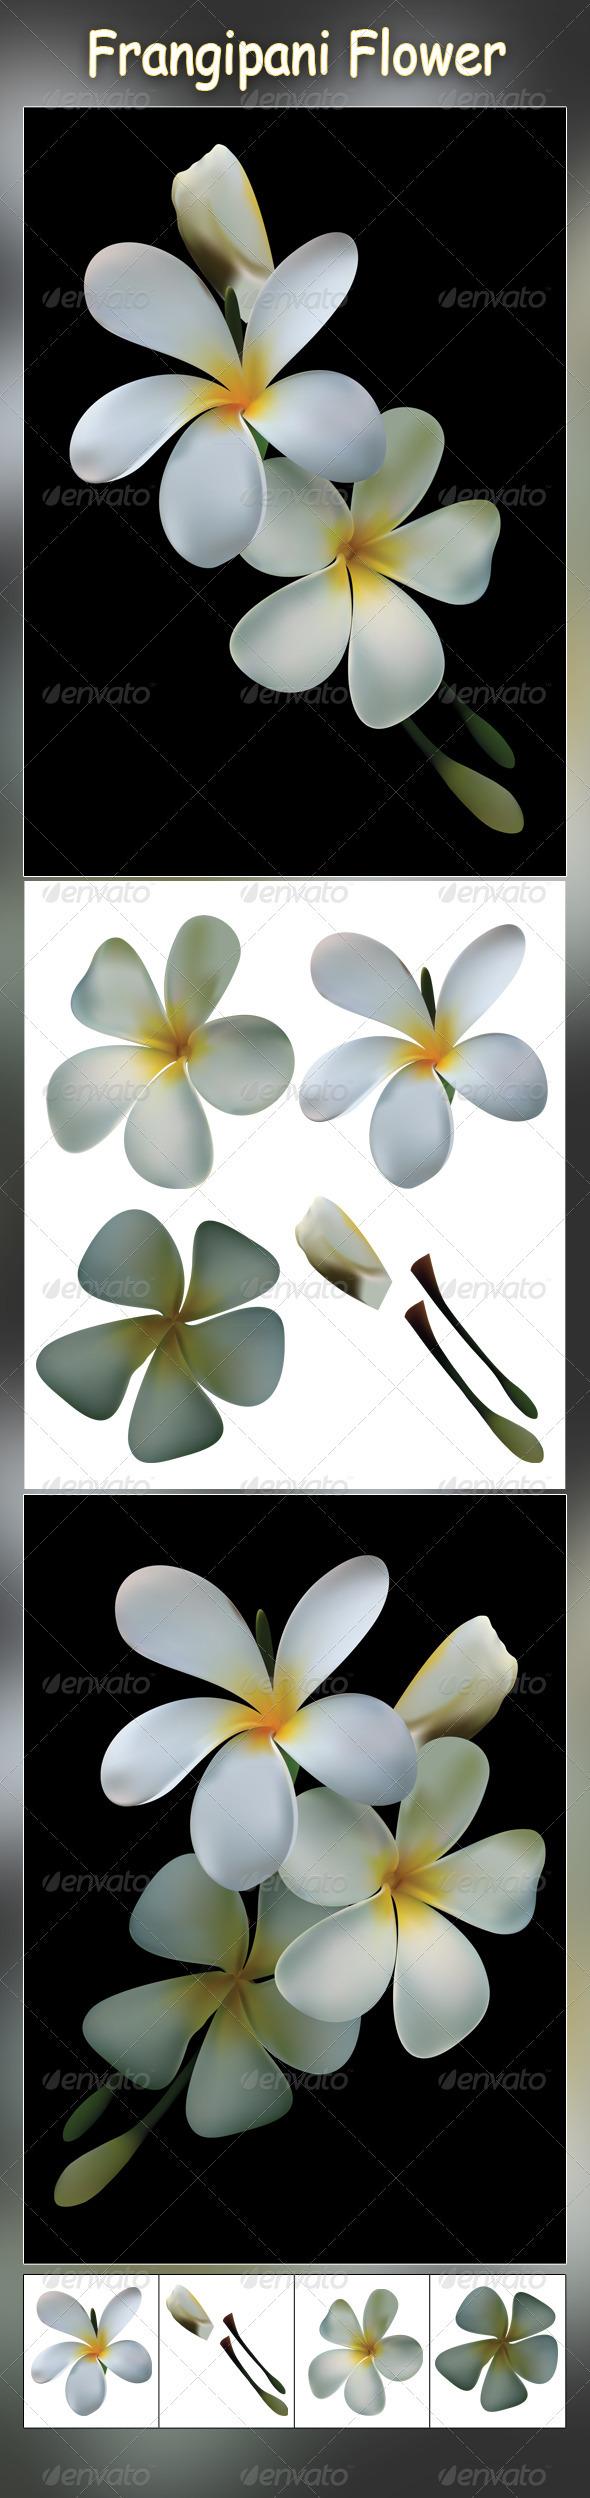 Frangipani Flower - Organic Objects Objects